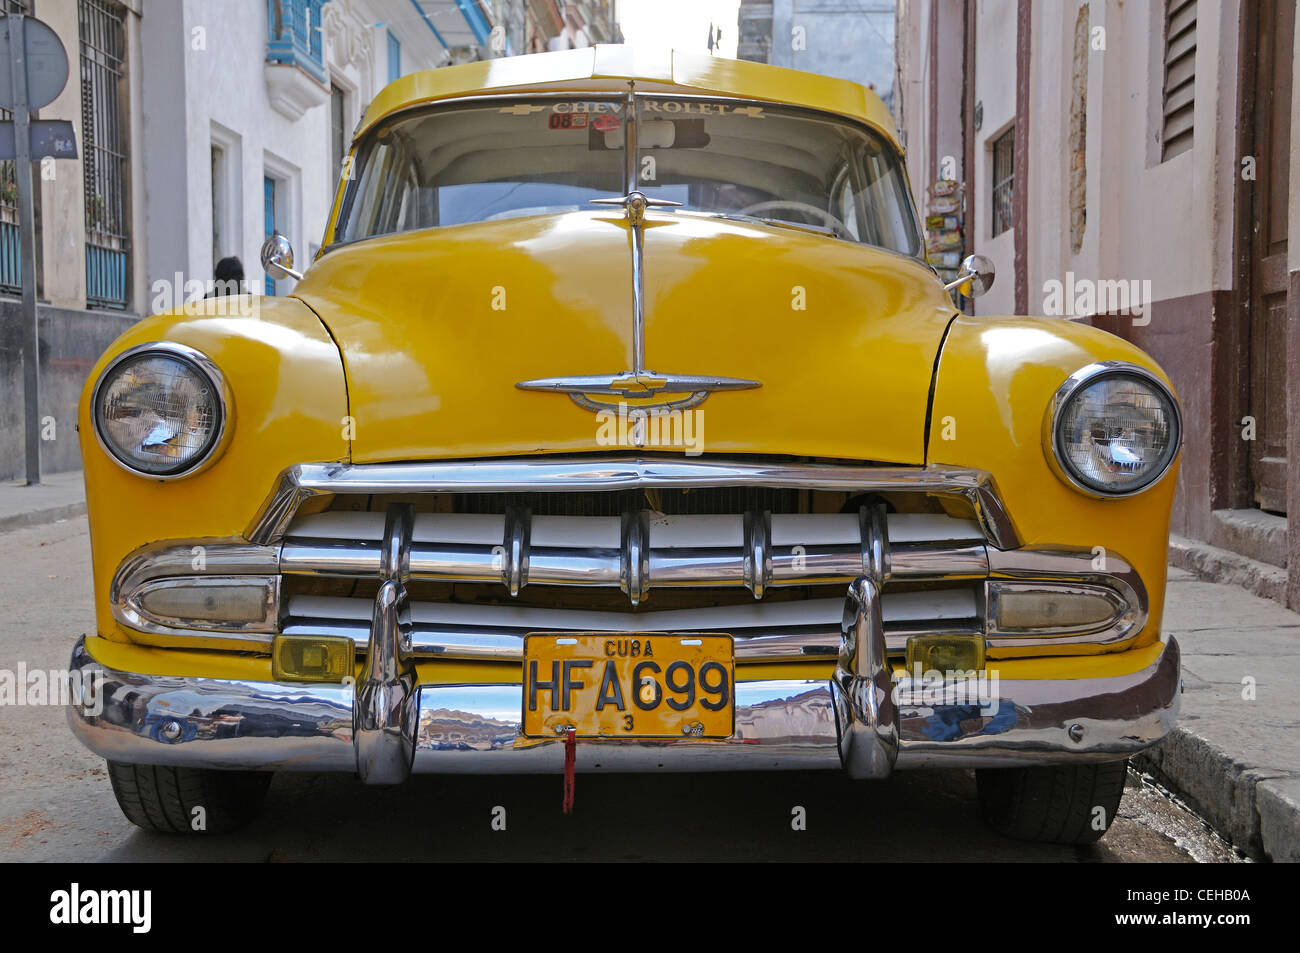 old chevrolet car on Cuba, yellow oldtimer, Cuba, Caribbean Stock ...